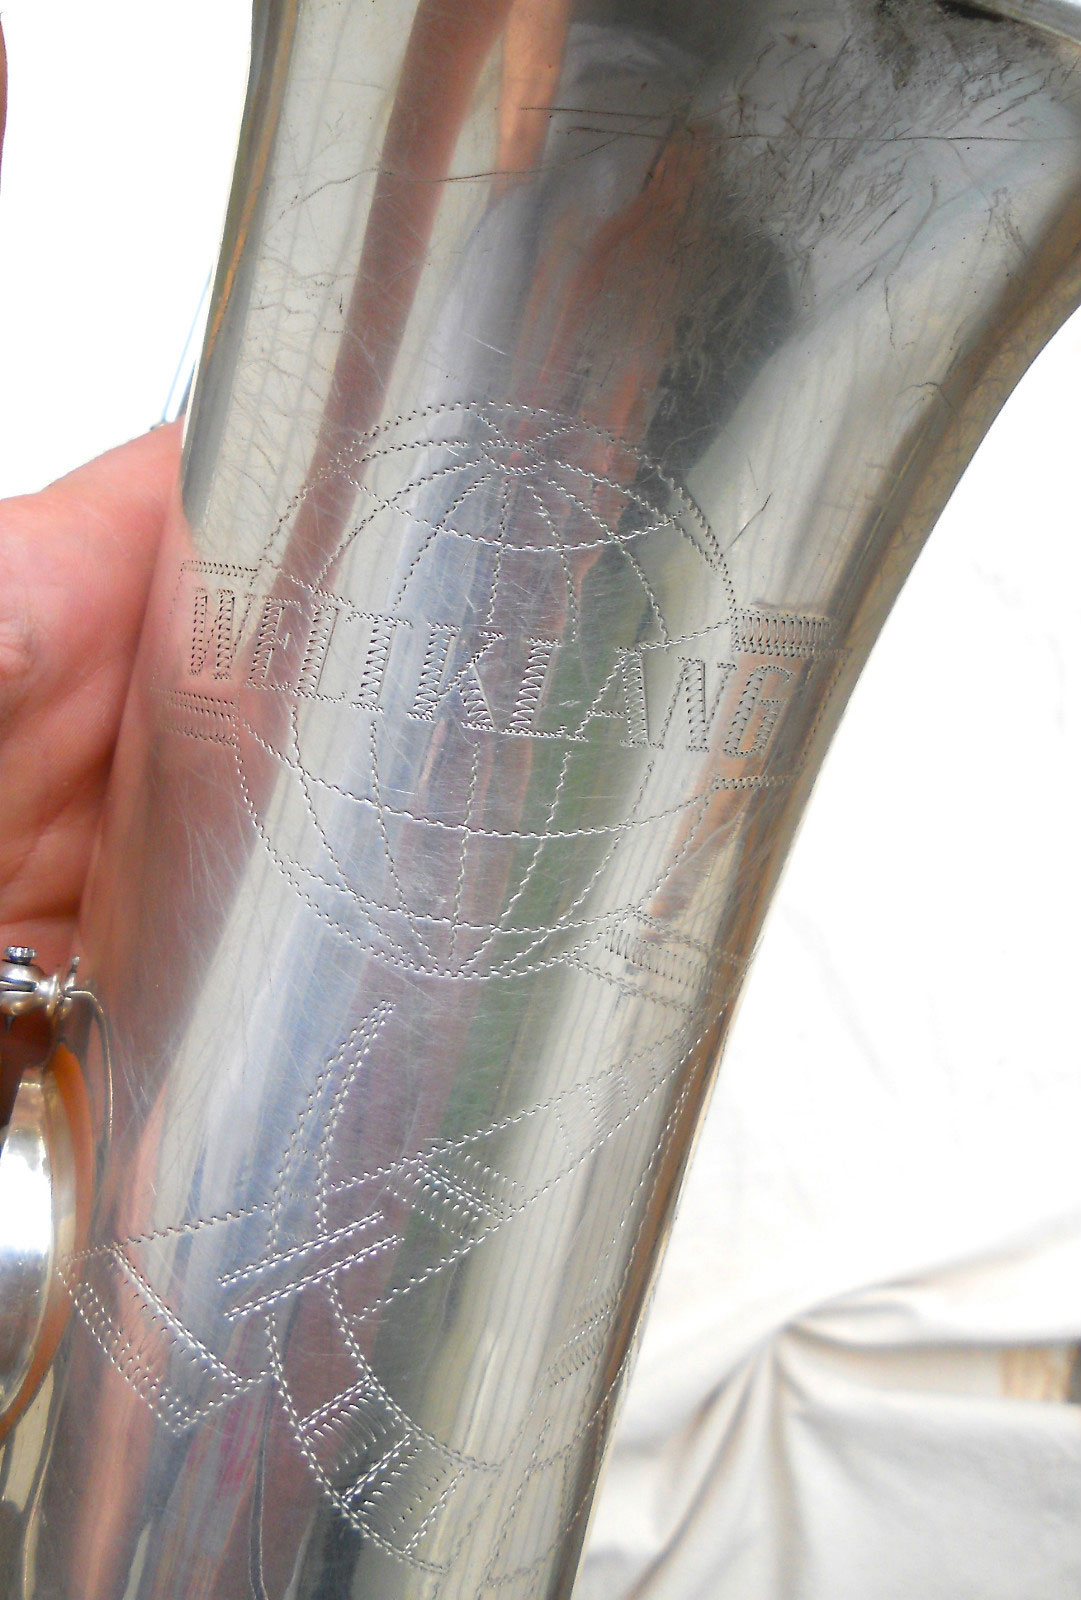 Weltklang, saxophone, bell engraving, German saxophone, DDR, vintage sax